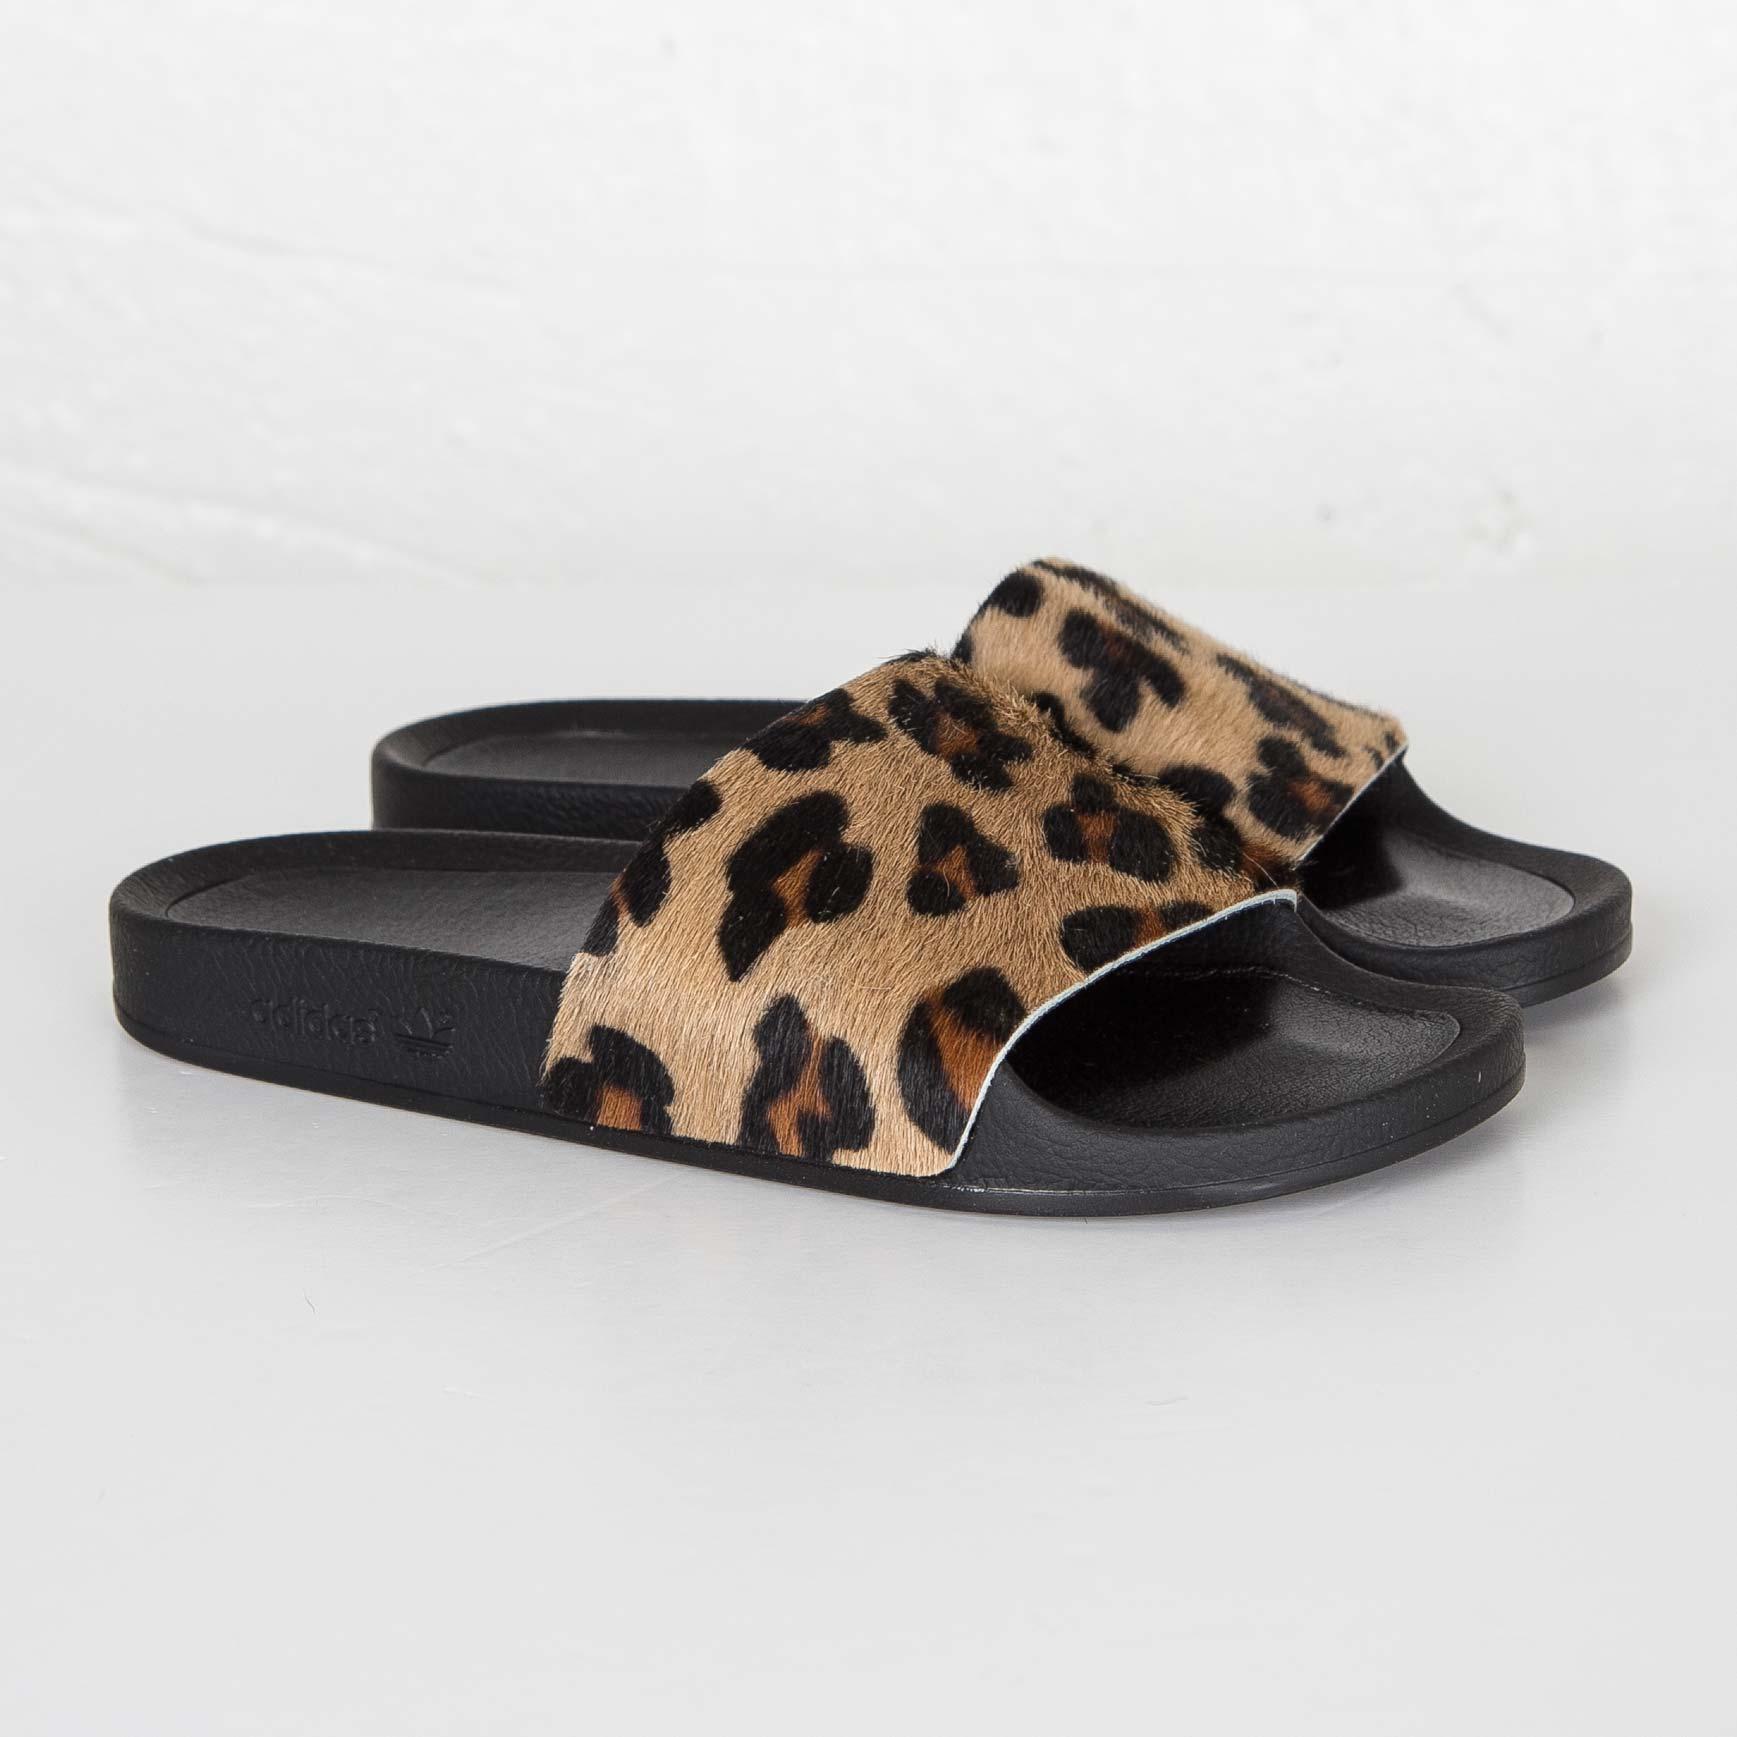 b18f4390b1c4 adidas Adilette Premium - S78697 - Sneakersnstuff